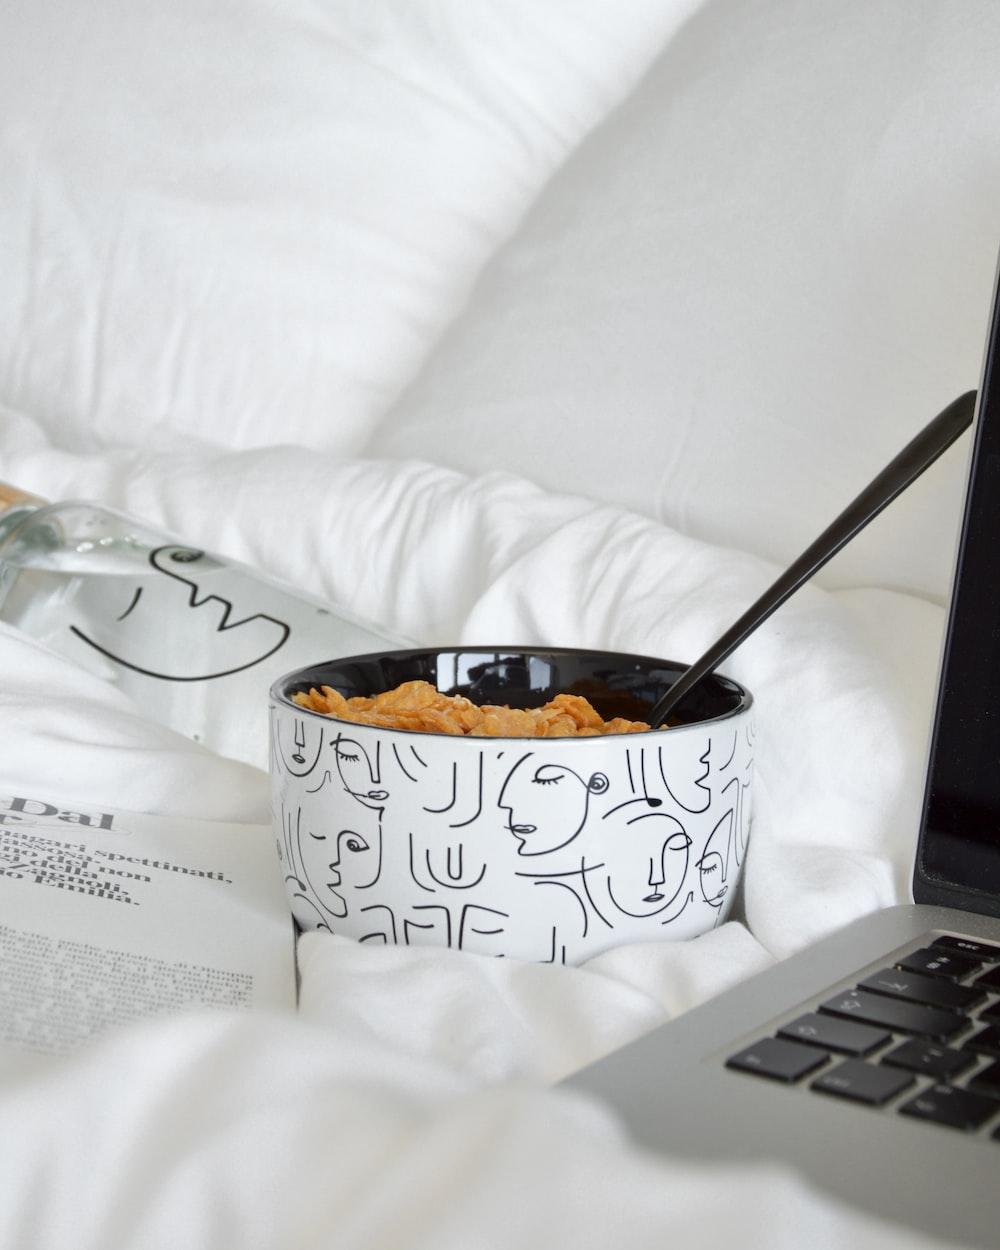 white and black ceramic mug with spoon